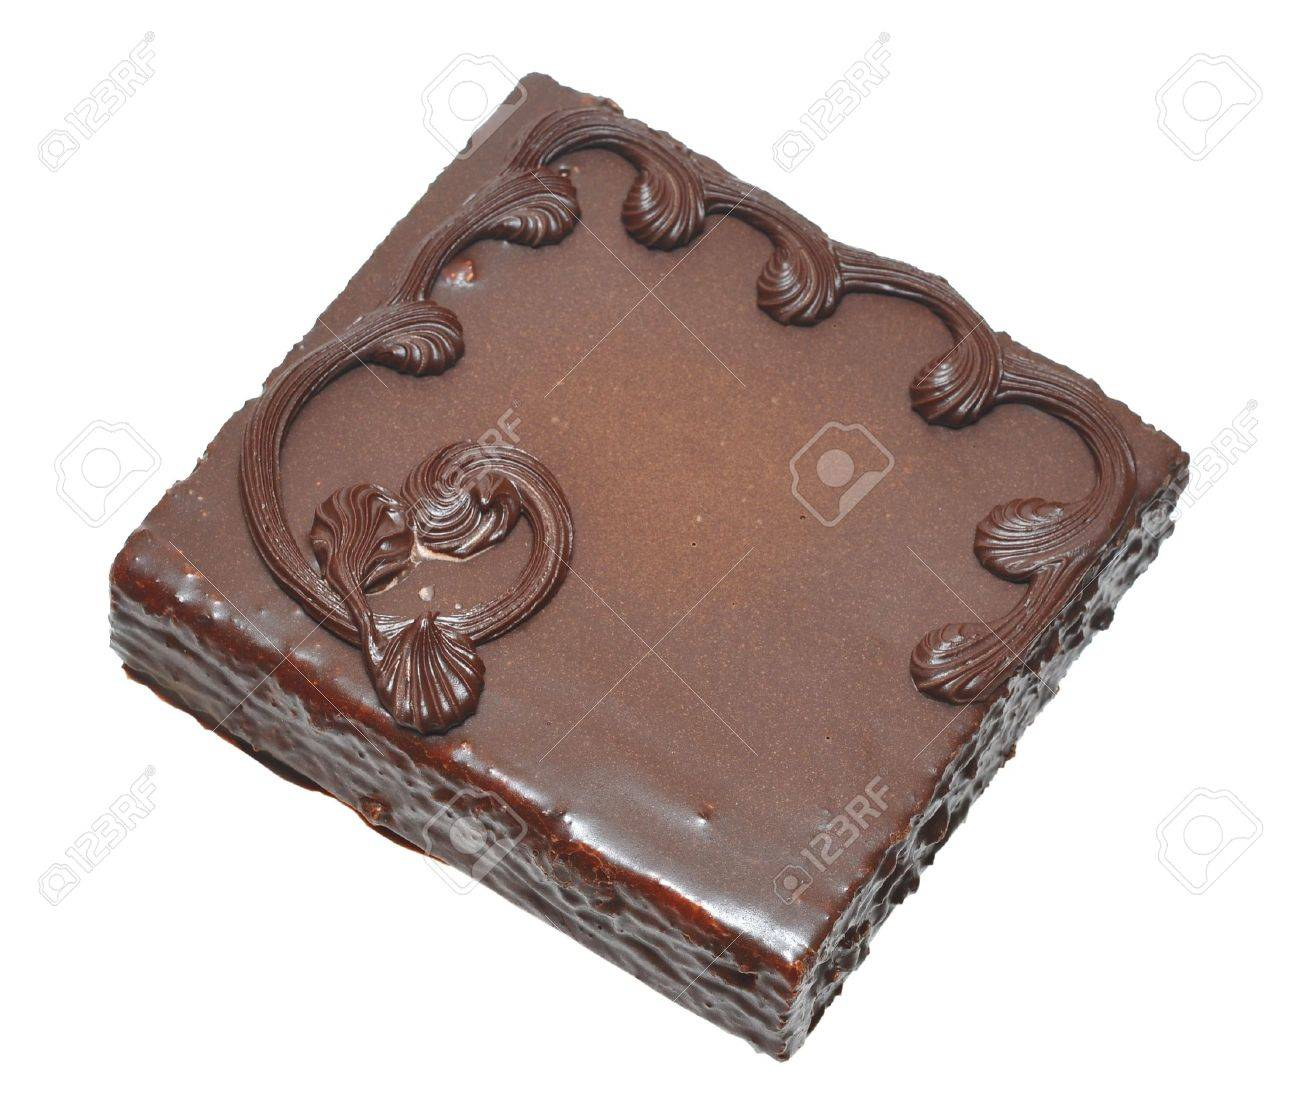 chocolate cake on a white background Stock Photo - 10365928